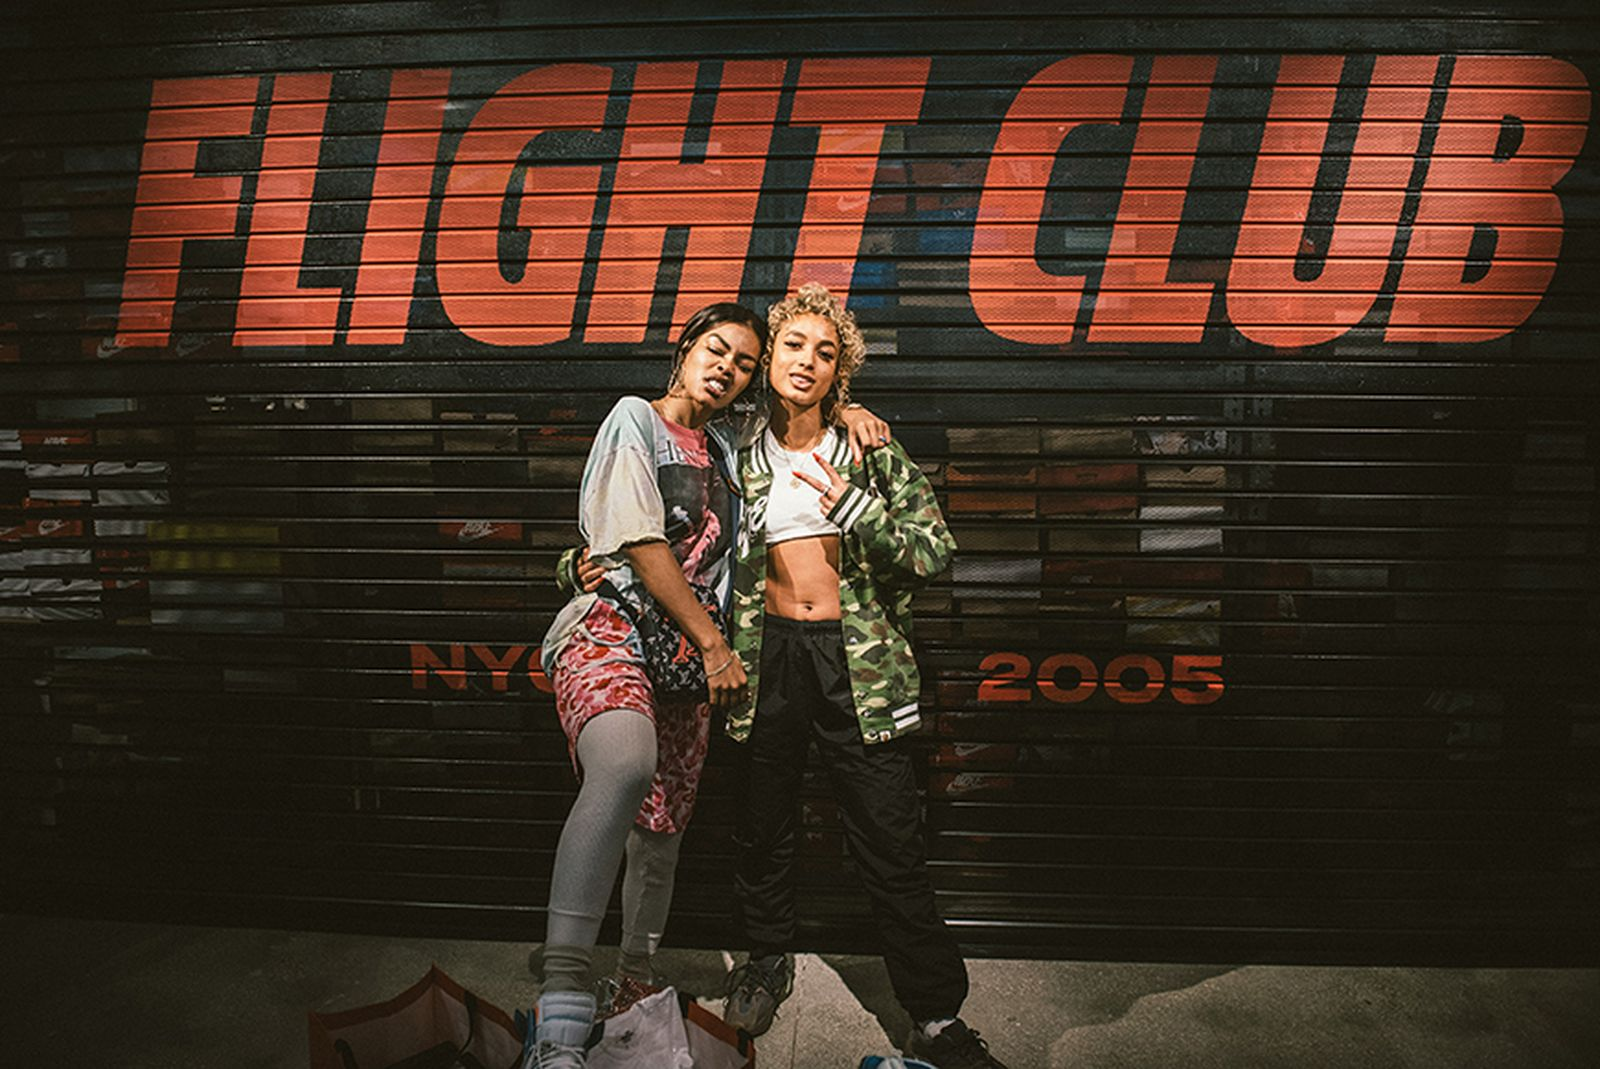 flight club miami